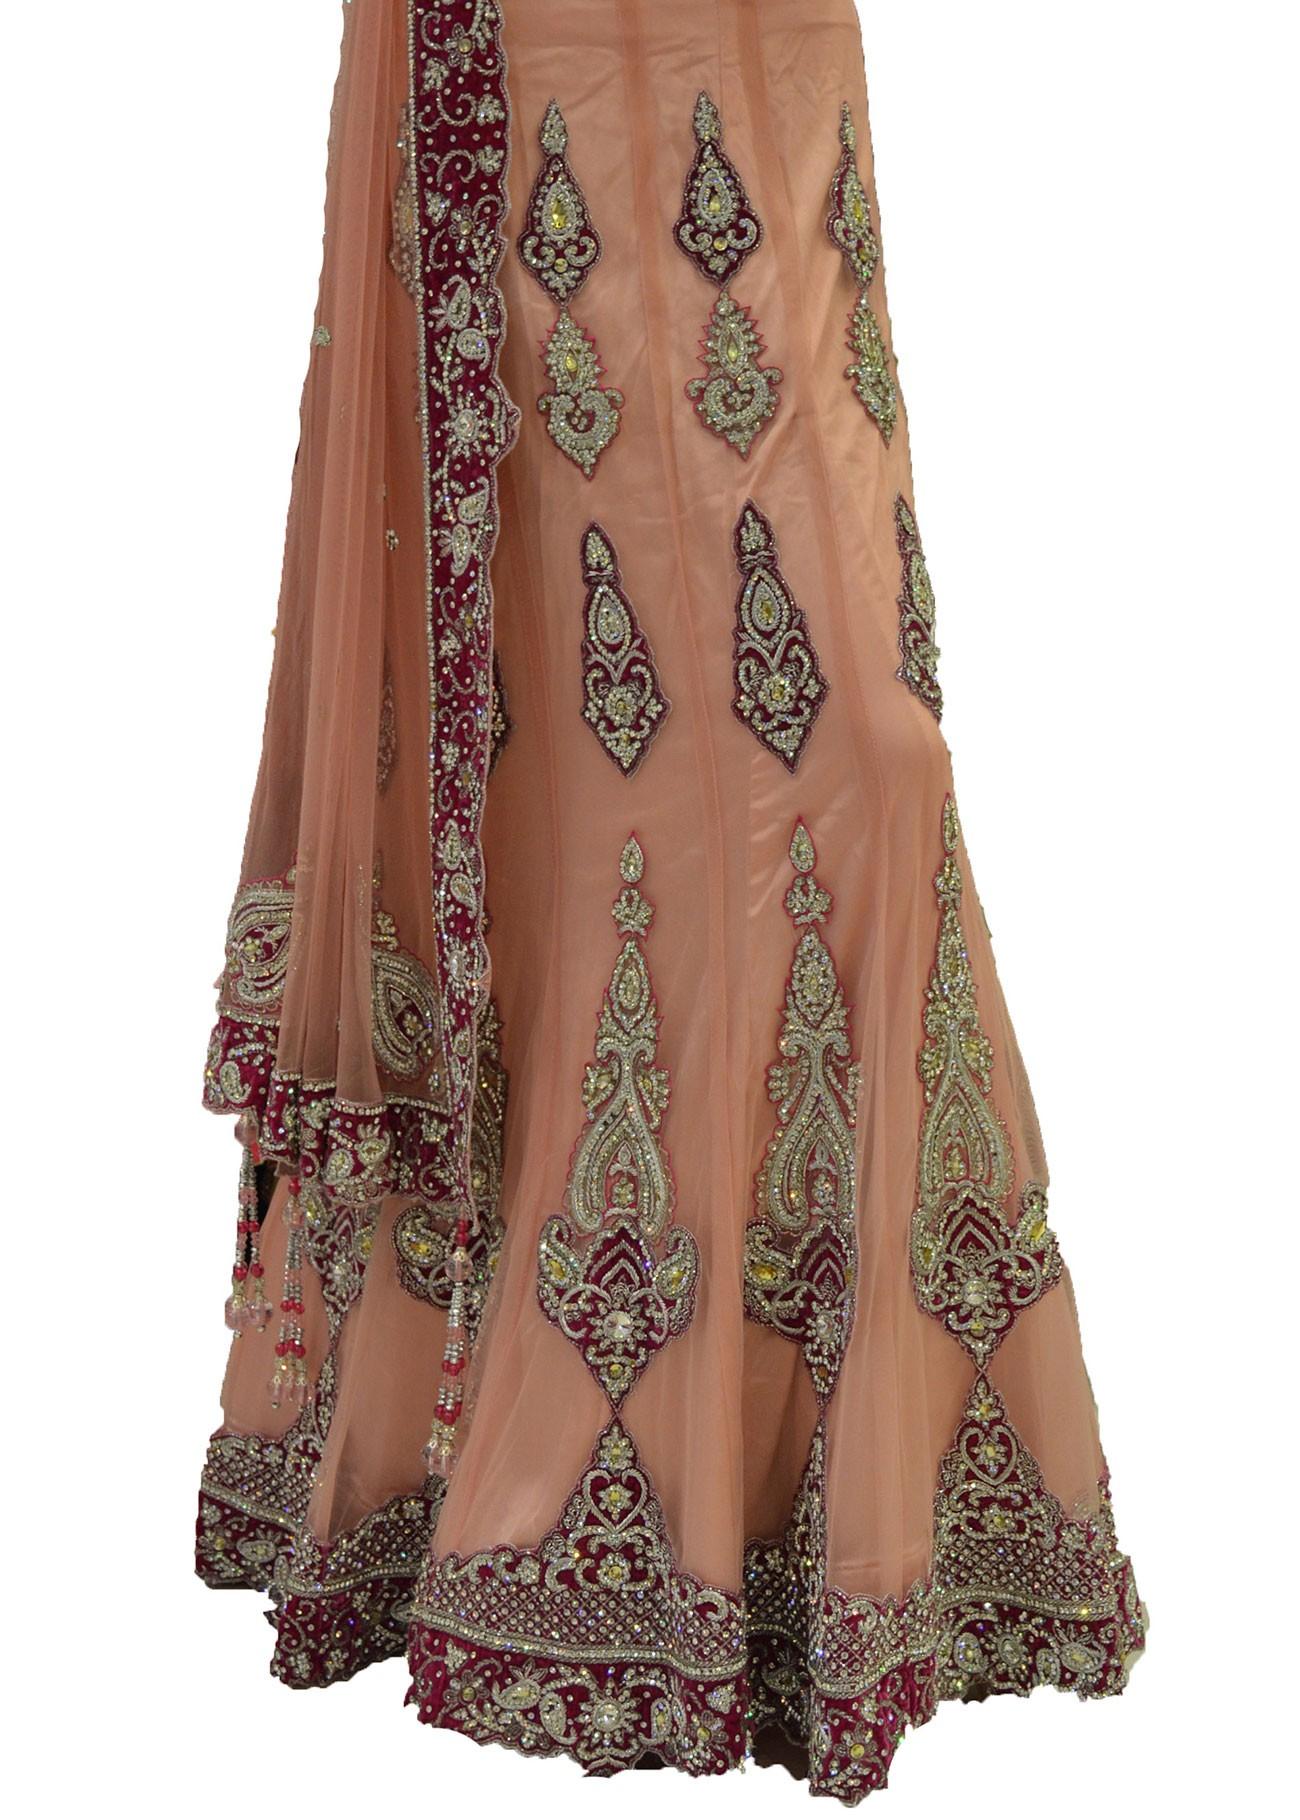 Pink Net Saree: Light Pink Net Lehenga Choli With Dupatta